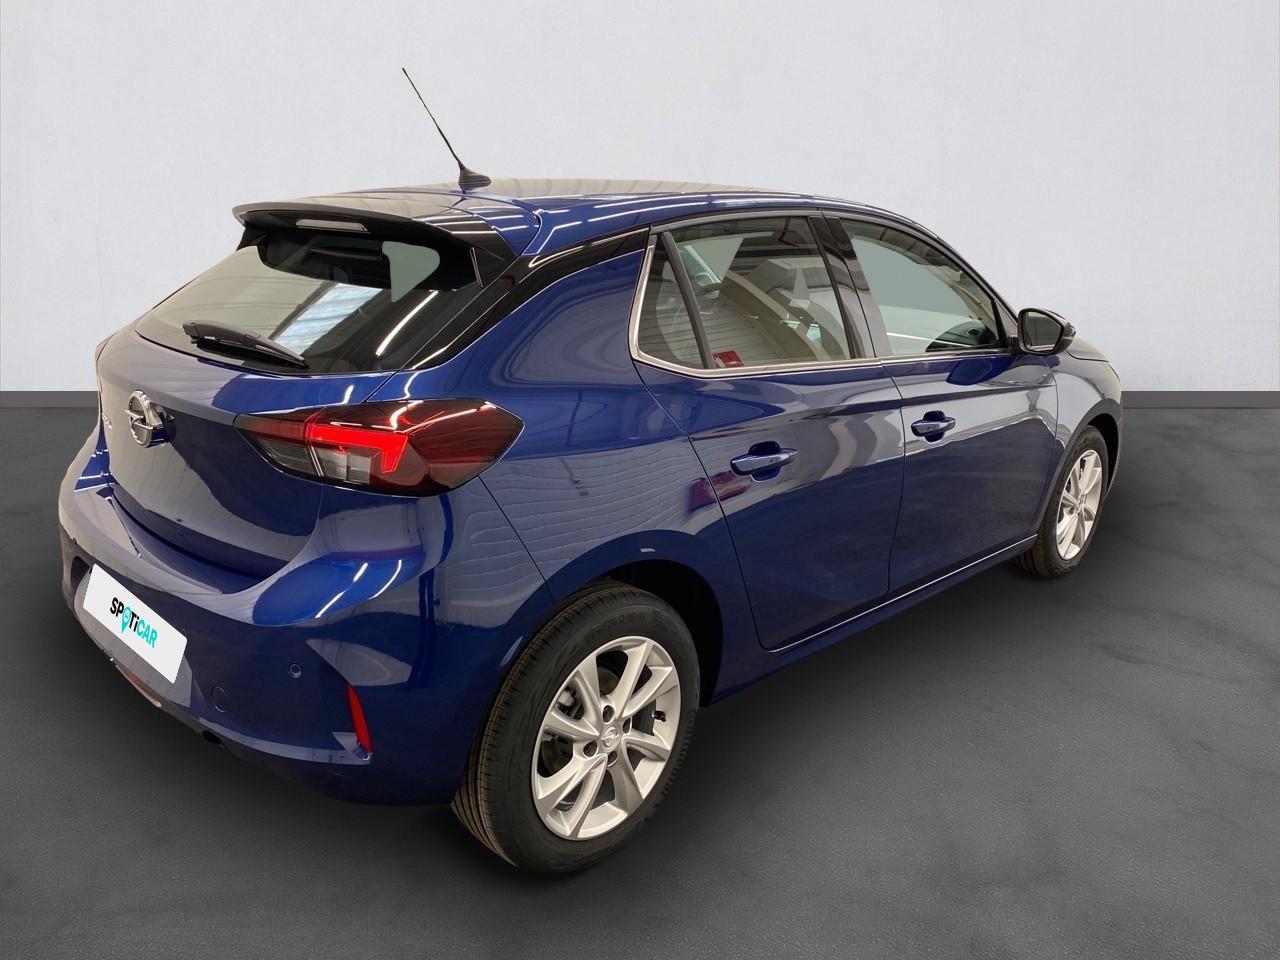 Opel CORSA 1.2 TURBO 100 CH BVM6 Elegance Essence de 2021 ...